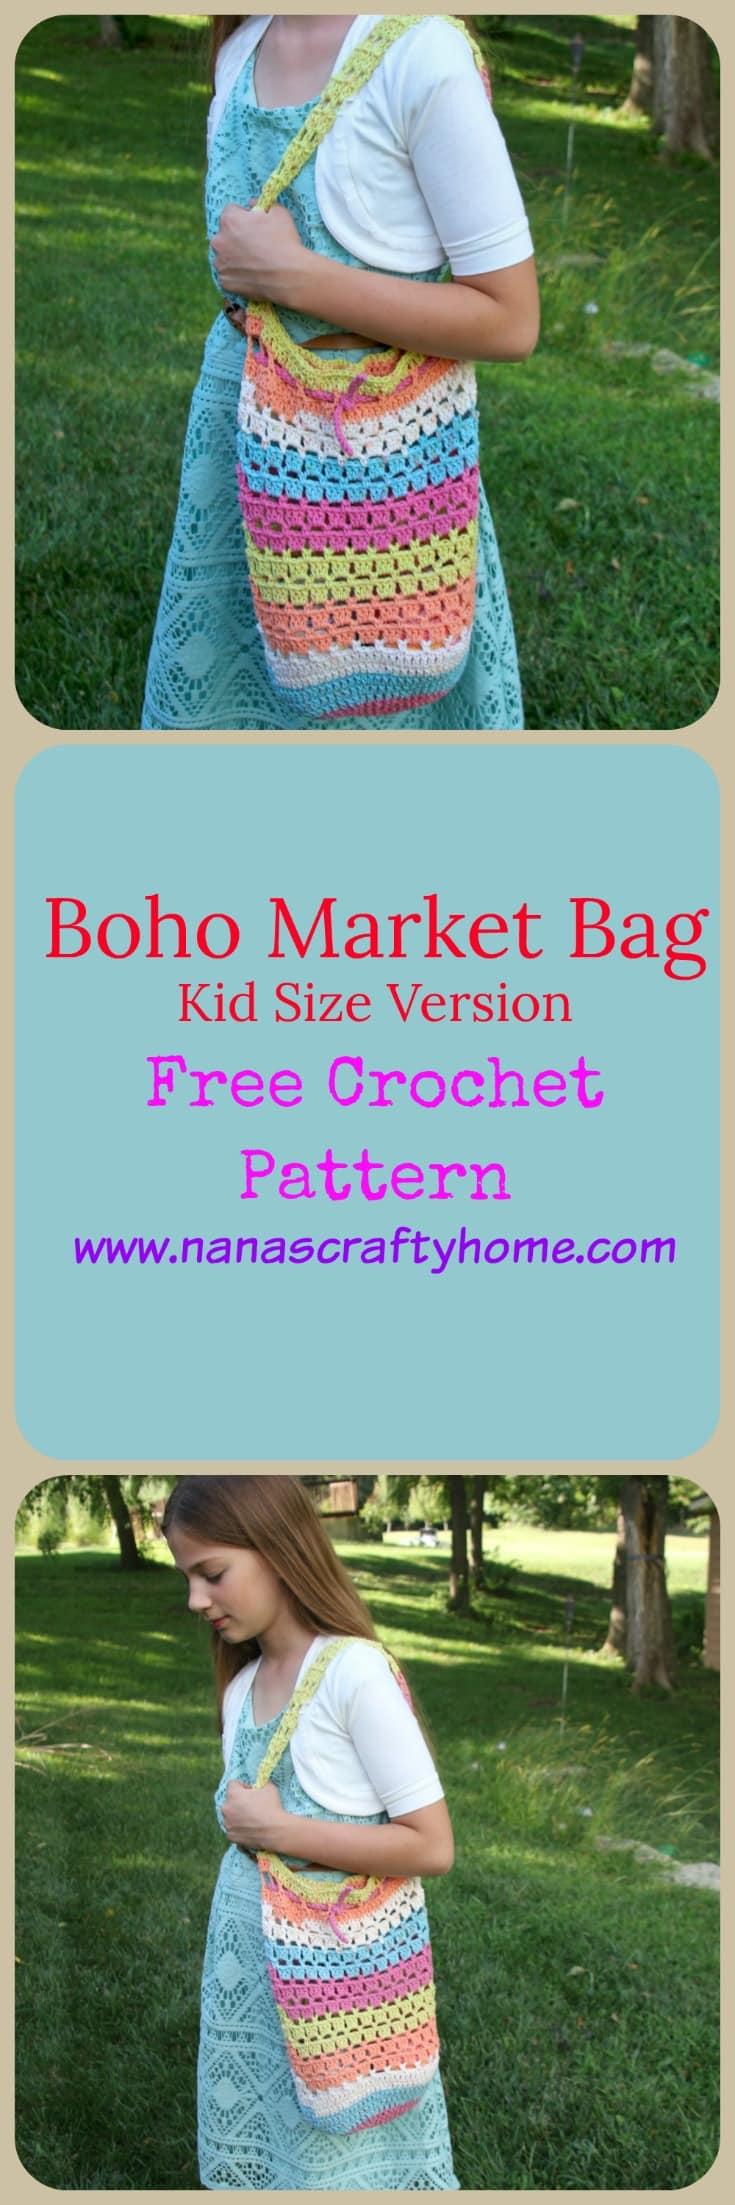 Boho Market Bag Crochet Pattern